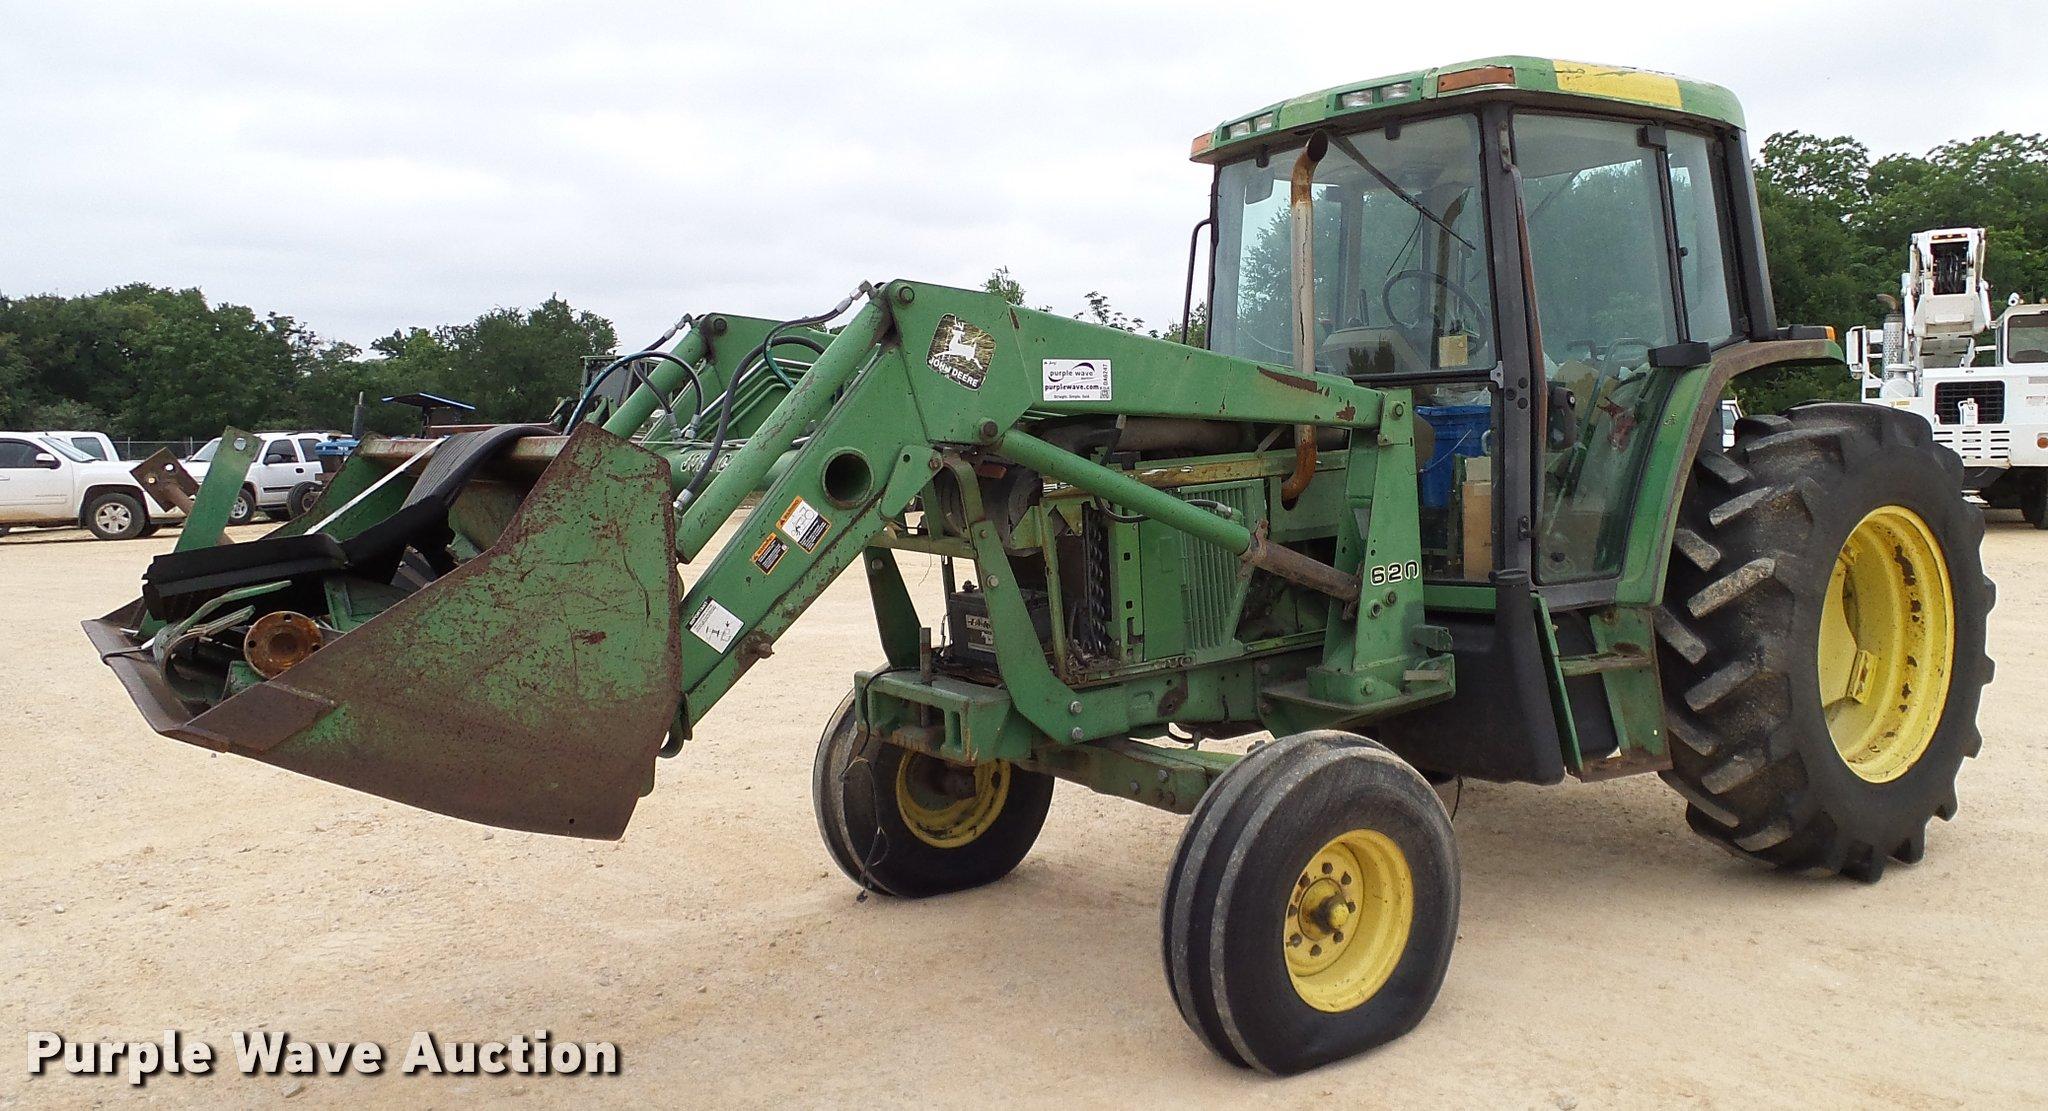 DA6247 1995 john deere 6400 tractor item da6247 sold! june 21 v